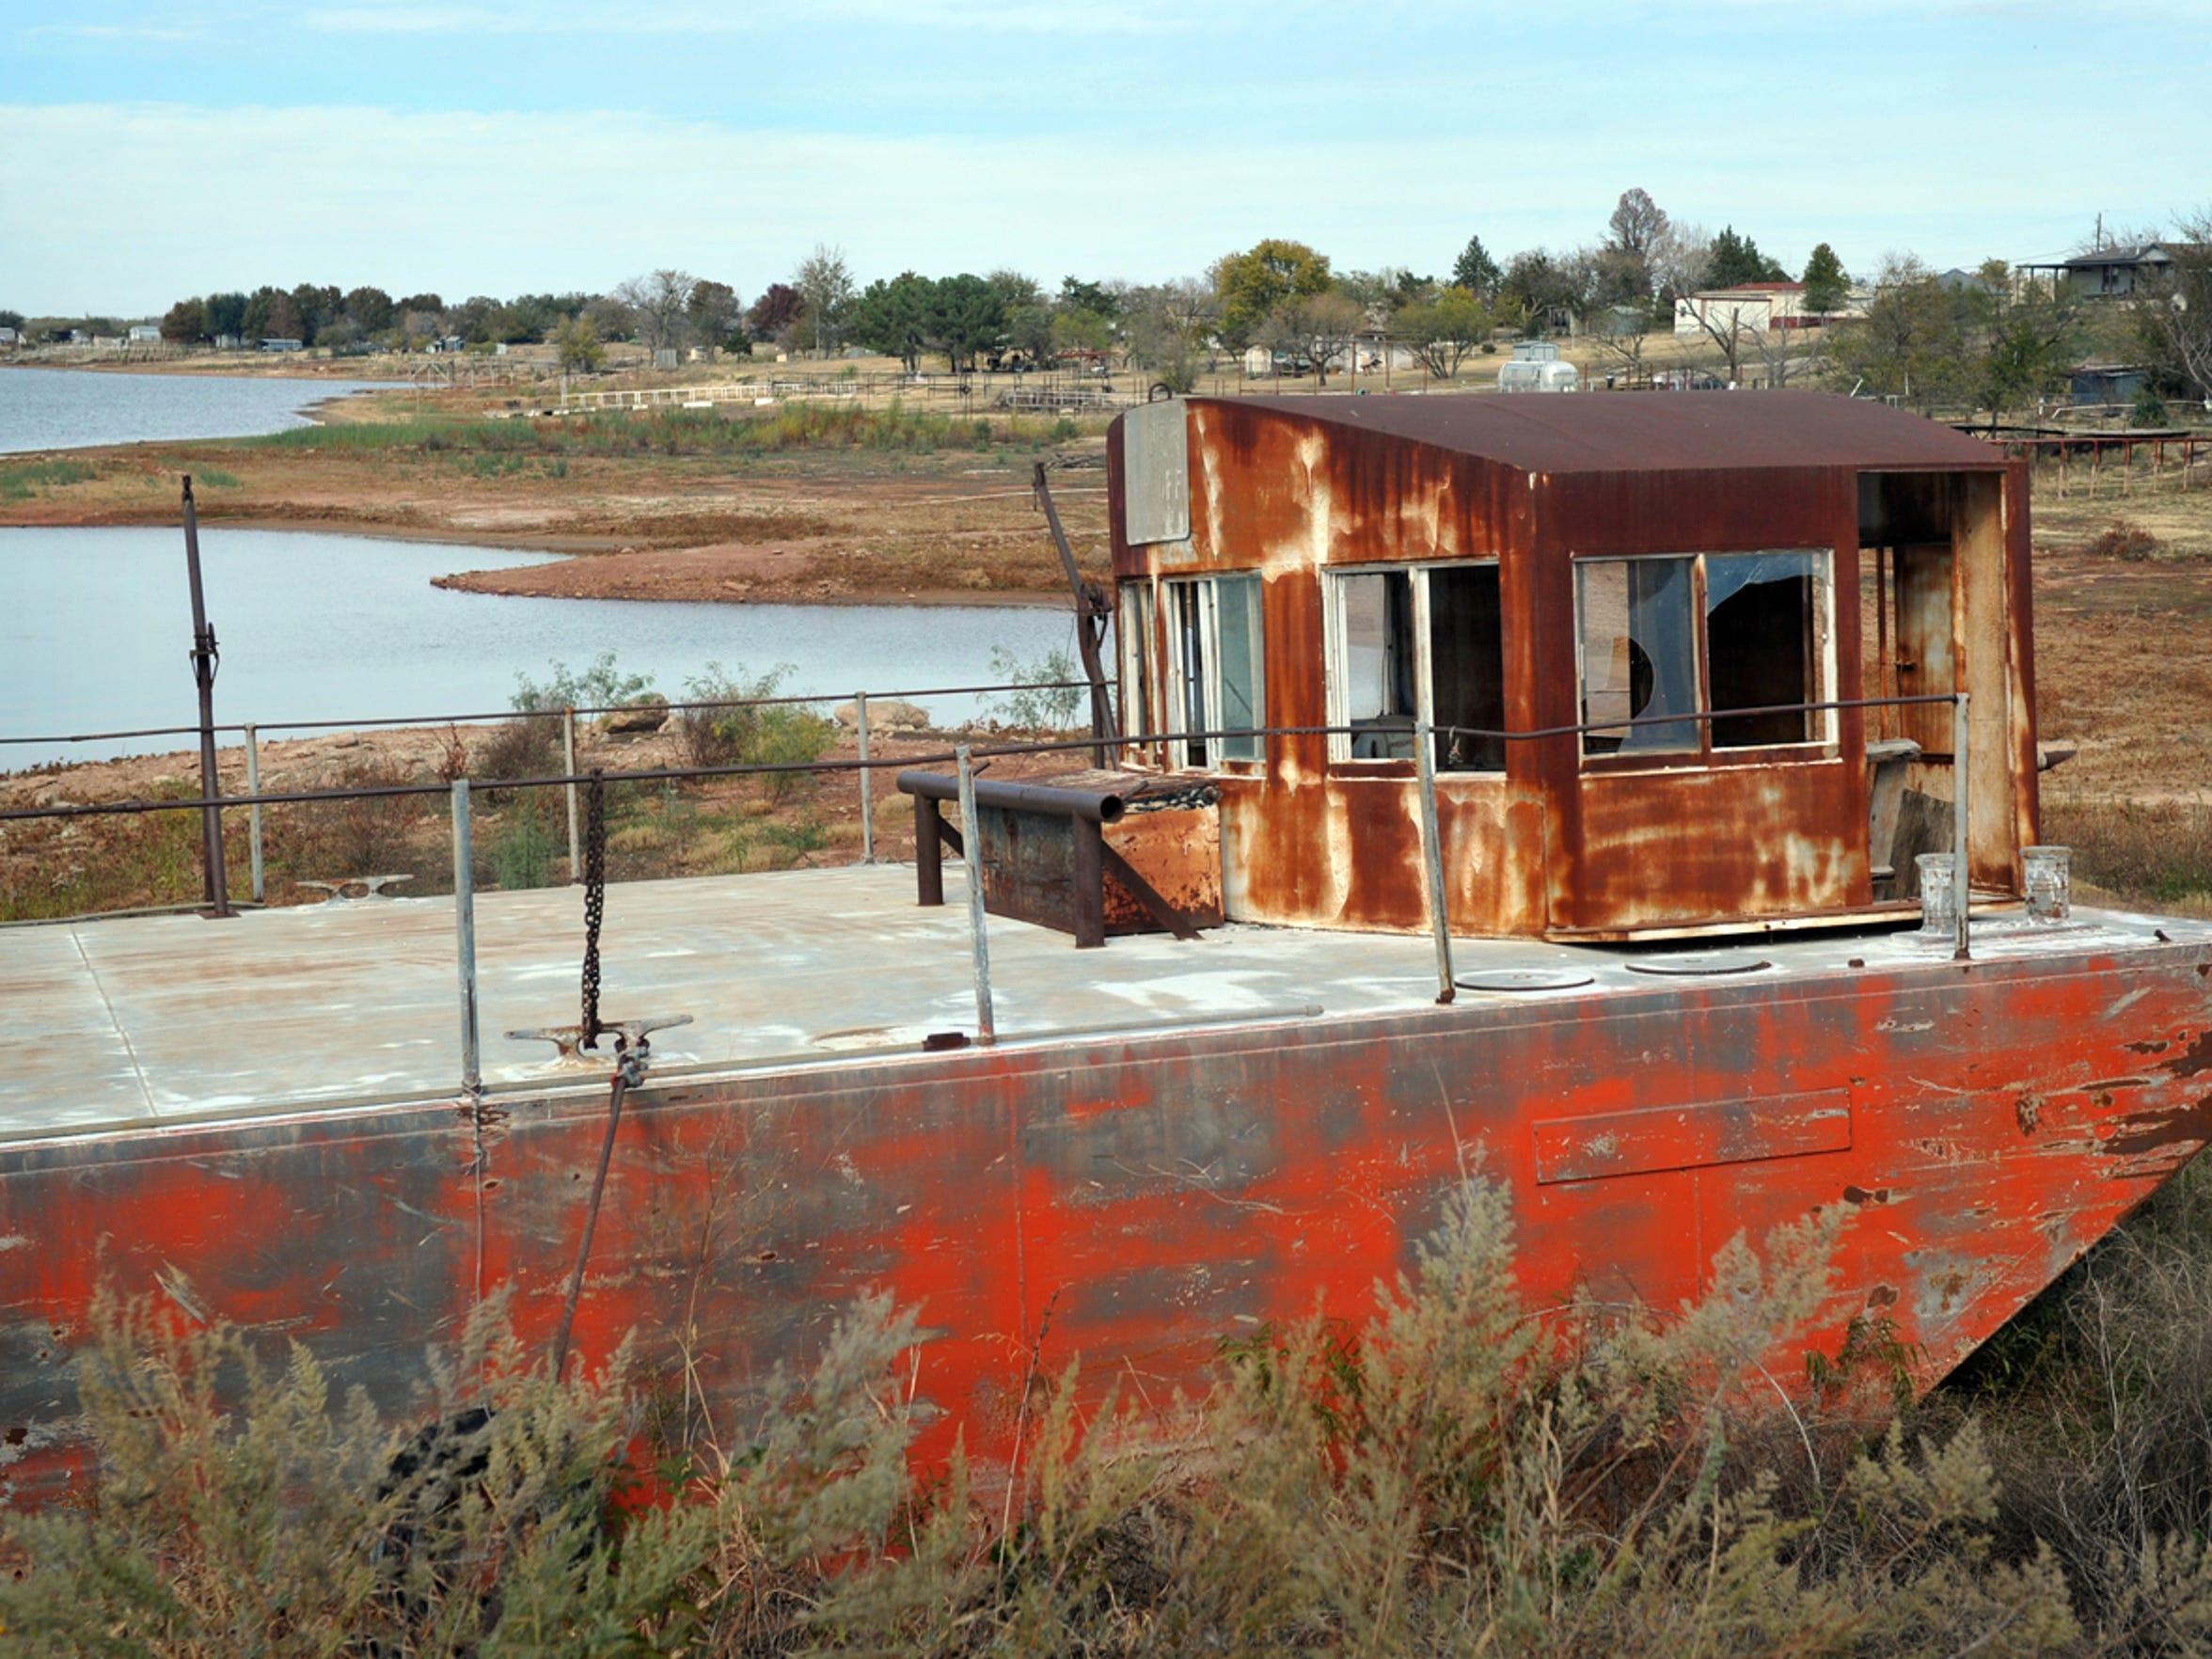 As the water levels of Lake Kickapoo and Lake Arrowhead